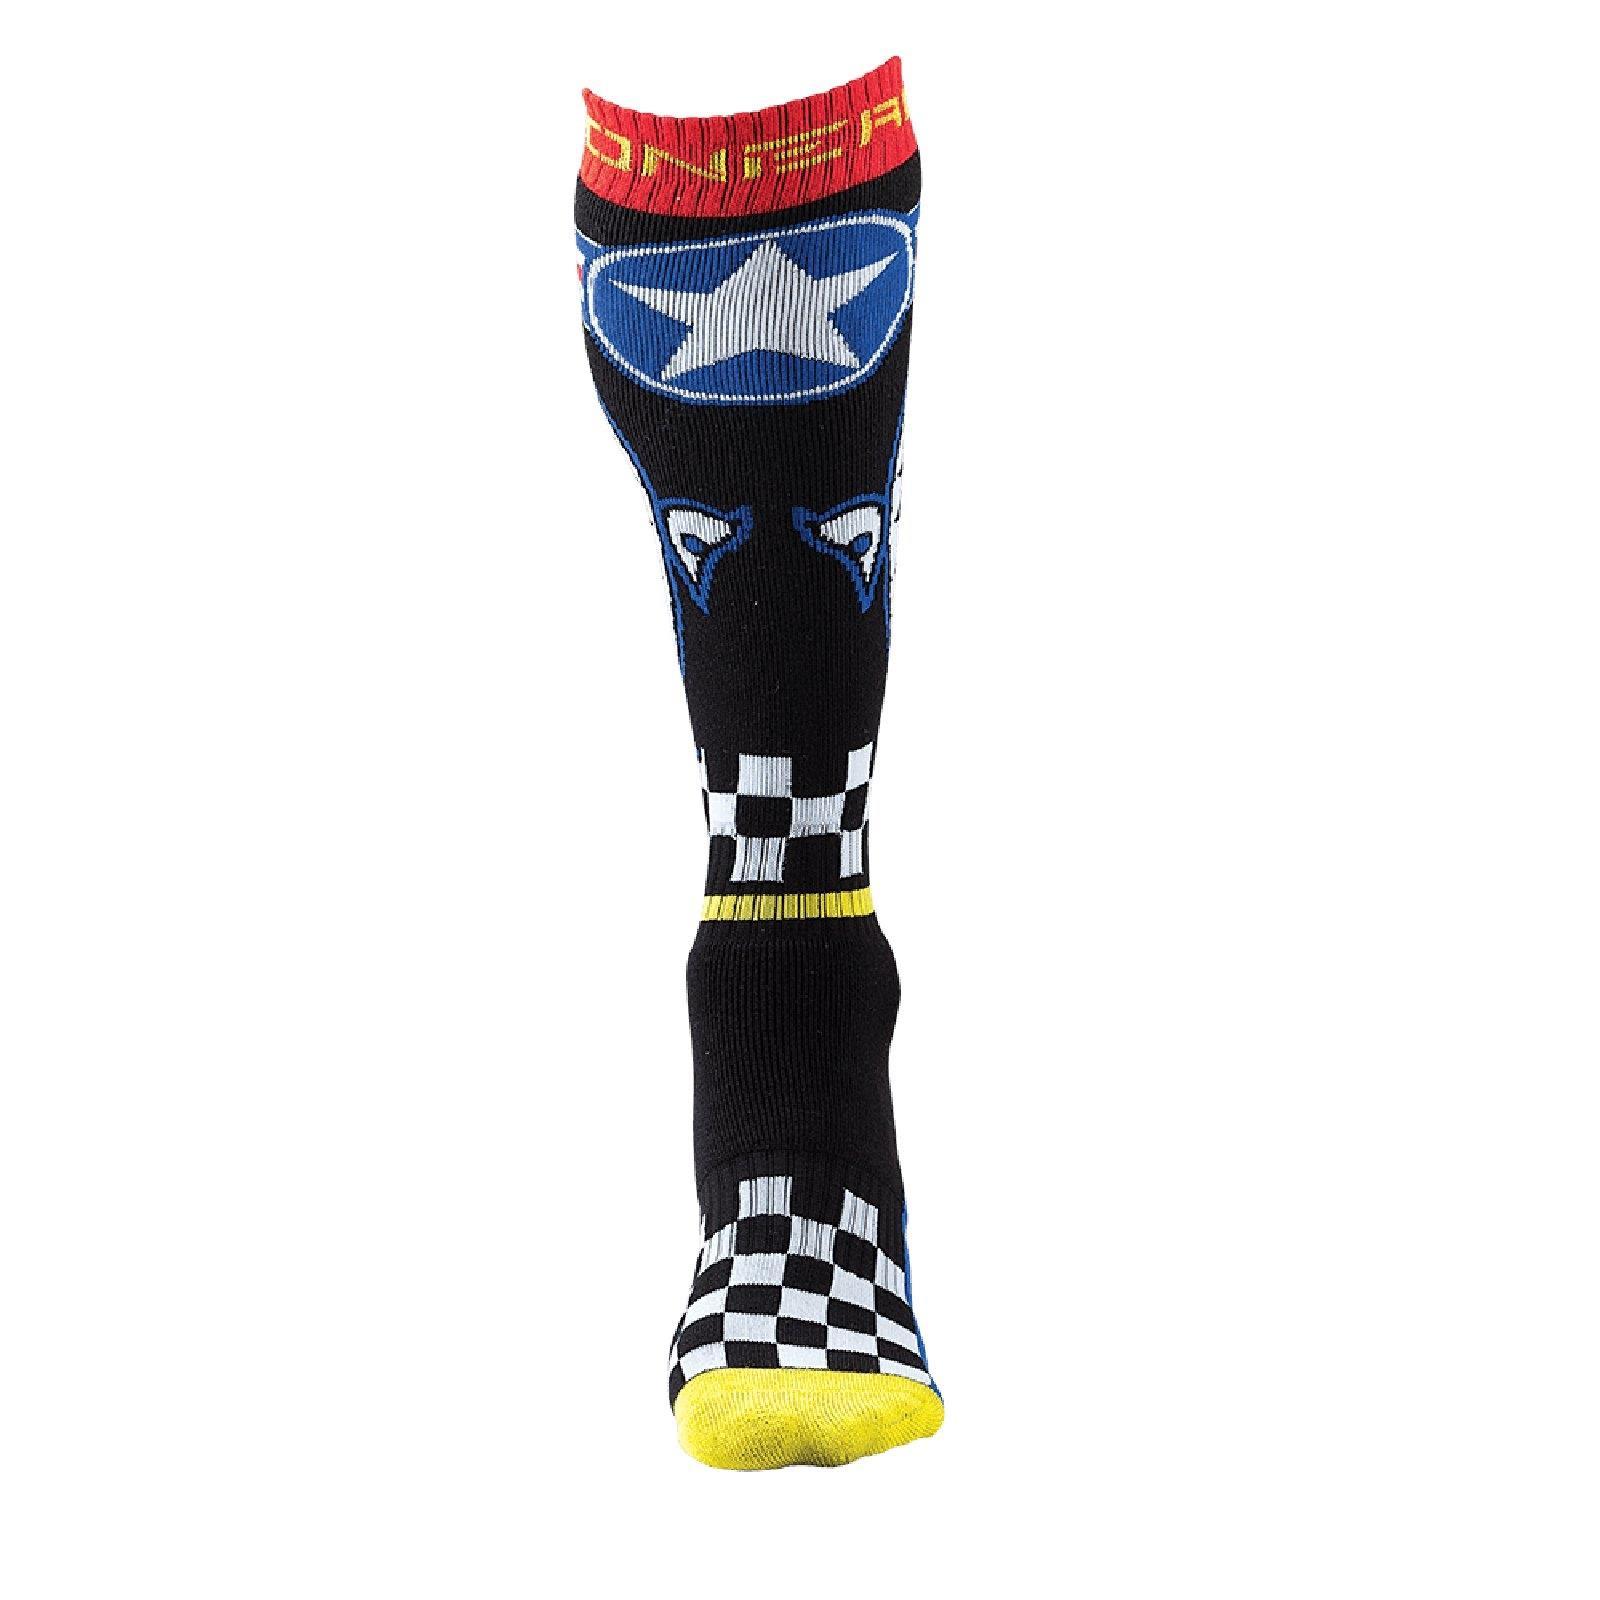 ONEAL-MOTO-CROSS-Calze-Moto-Enduro-MX-MTB-ATV-Quad-Calze-Sock-BICICLETTA-FR miniatura 54